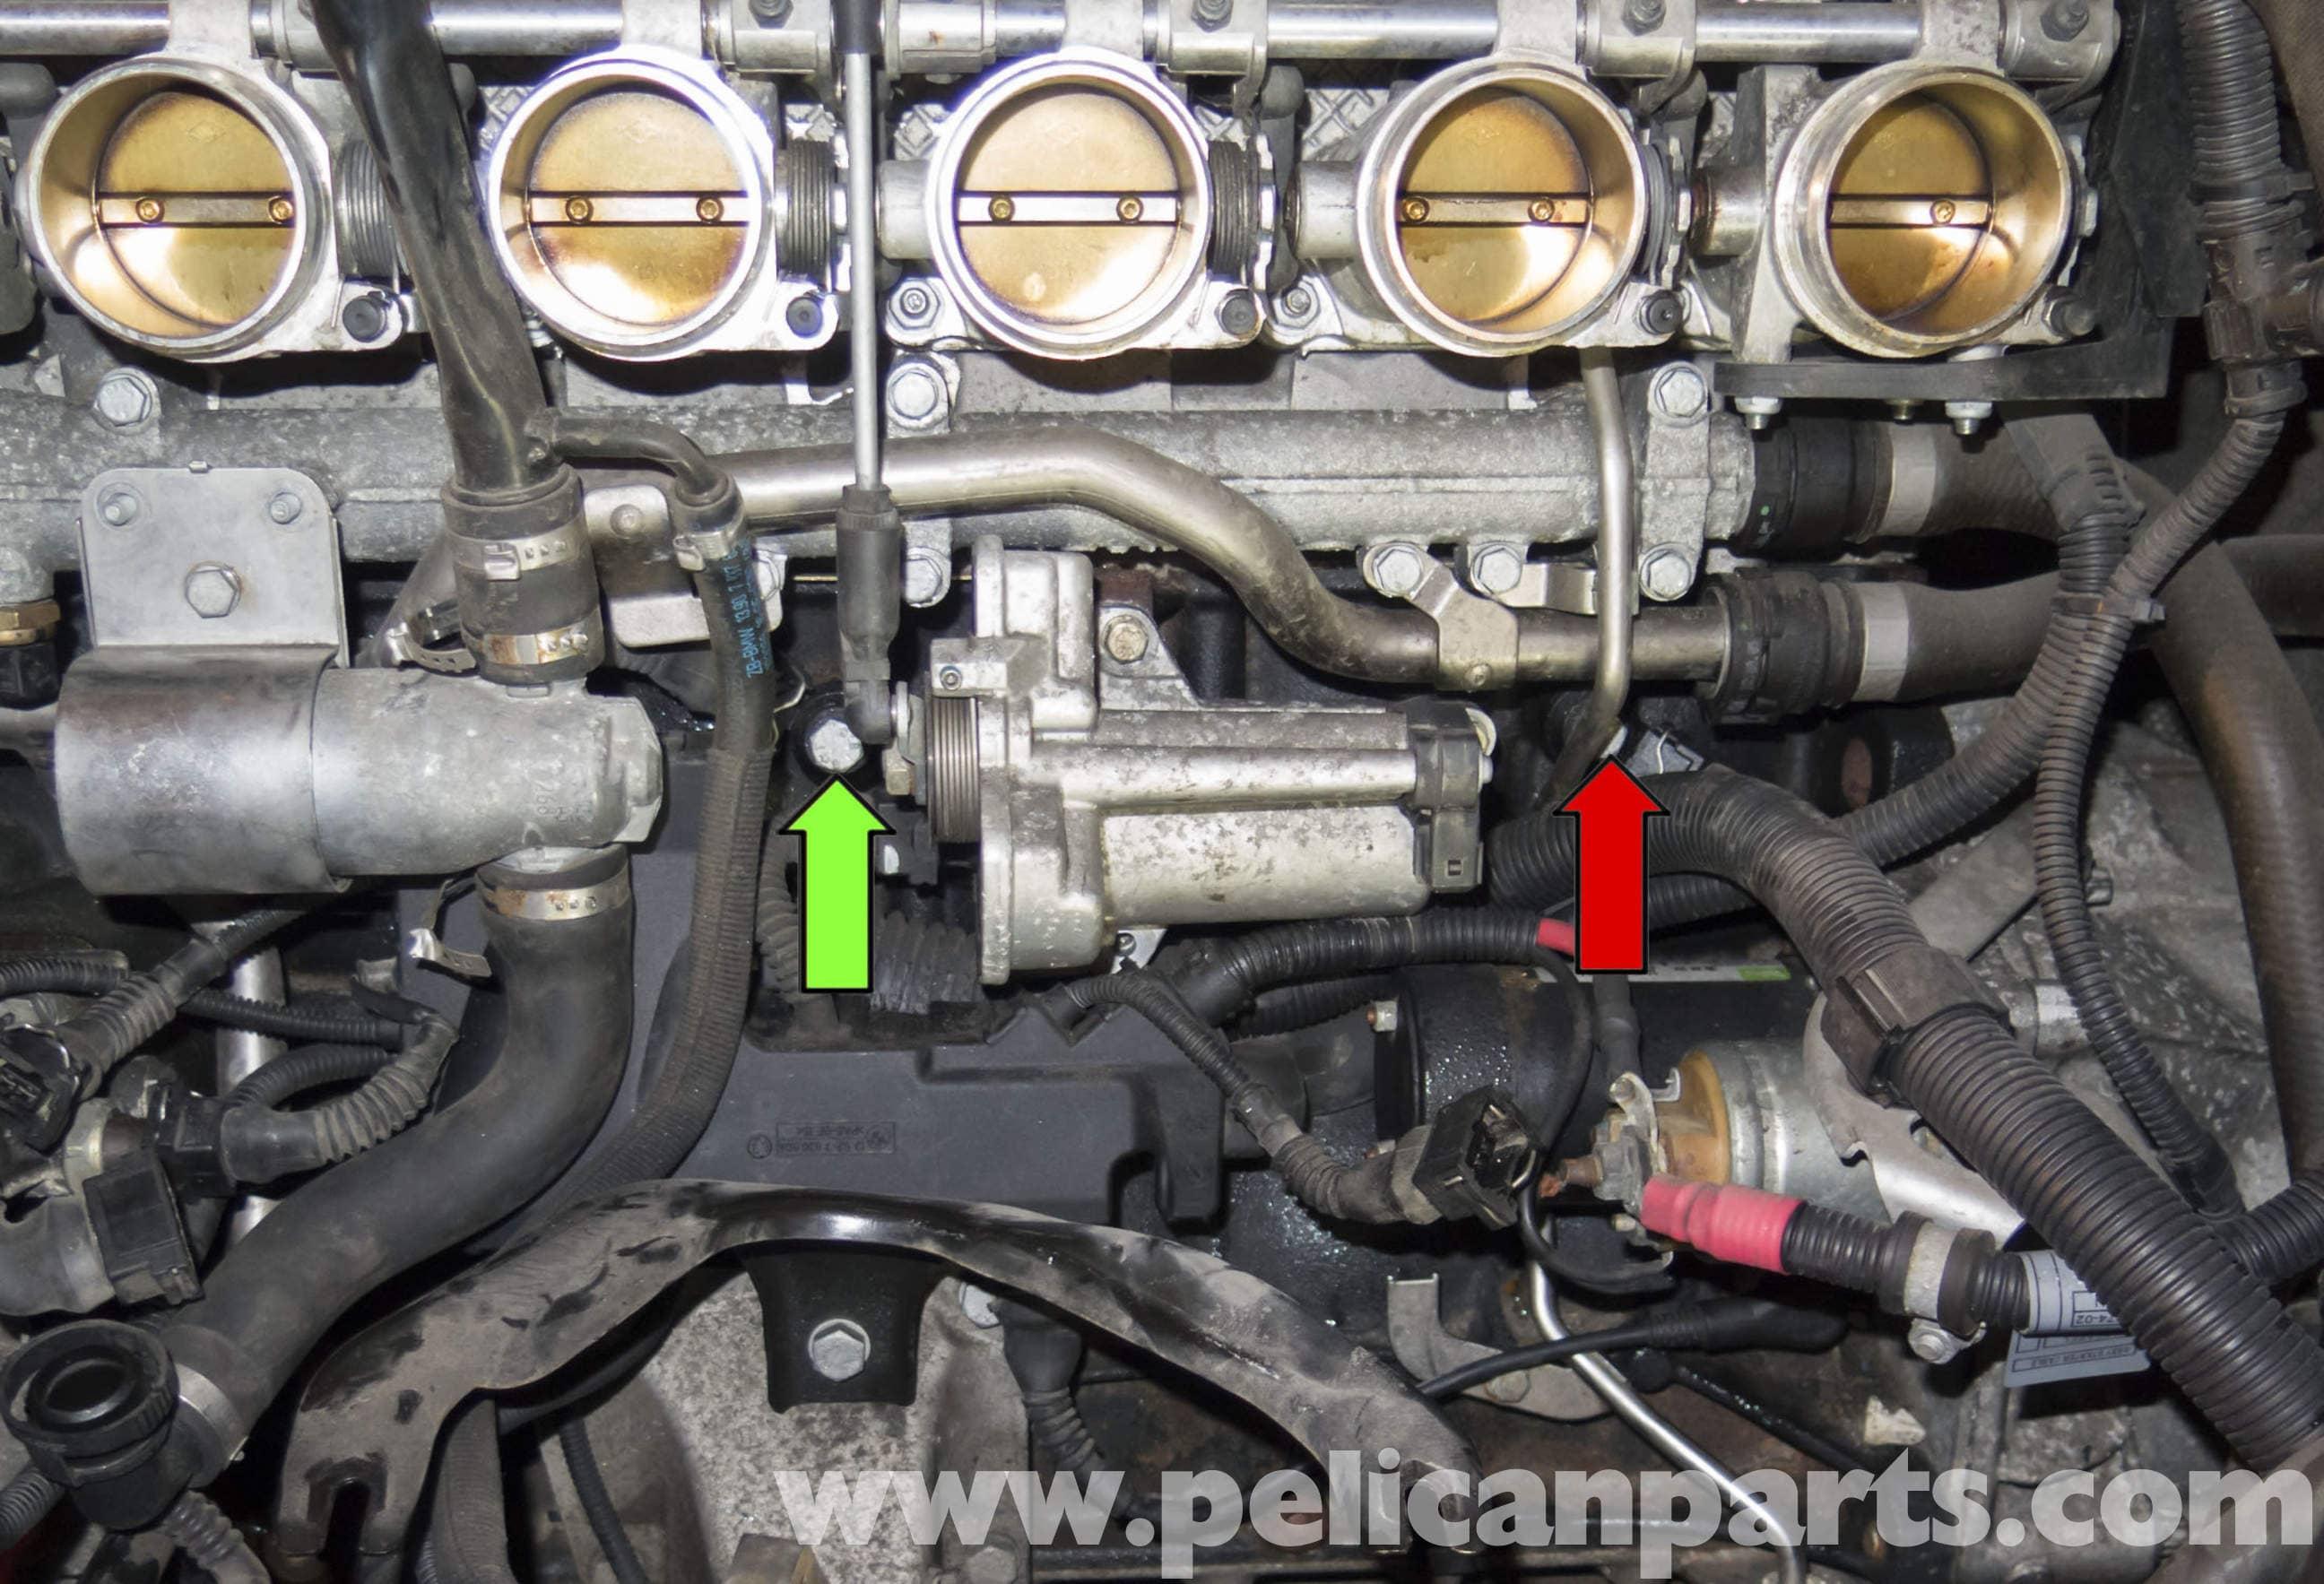 Bmw Z4 M Knock Sensor Testing And Replacement 2003 2006 Pelican Parts Diy Maintenance Article